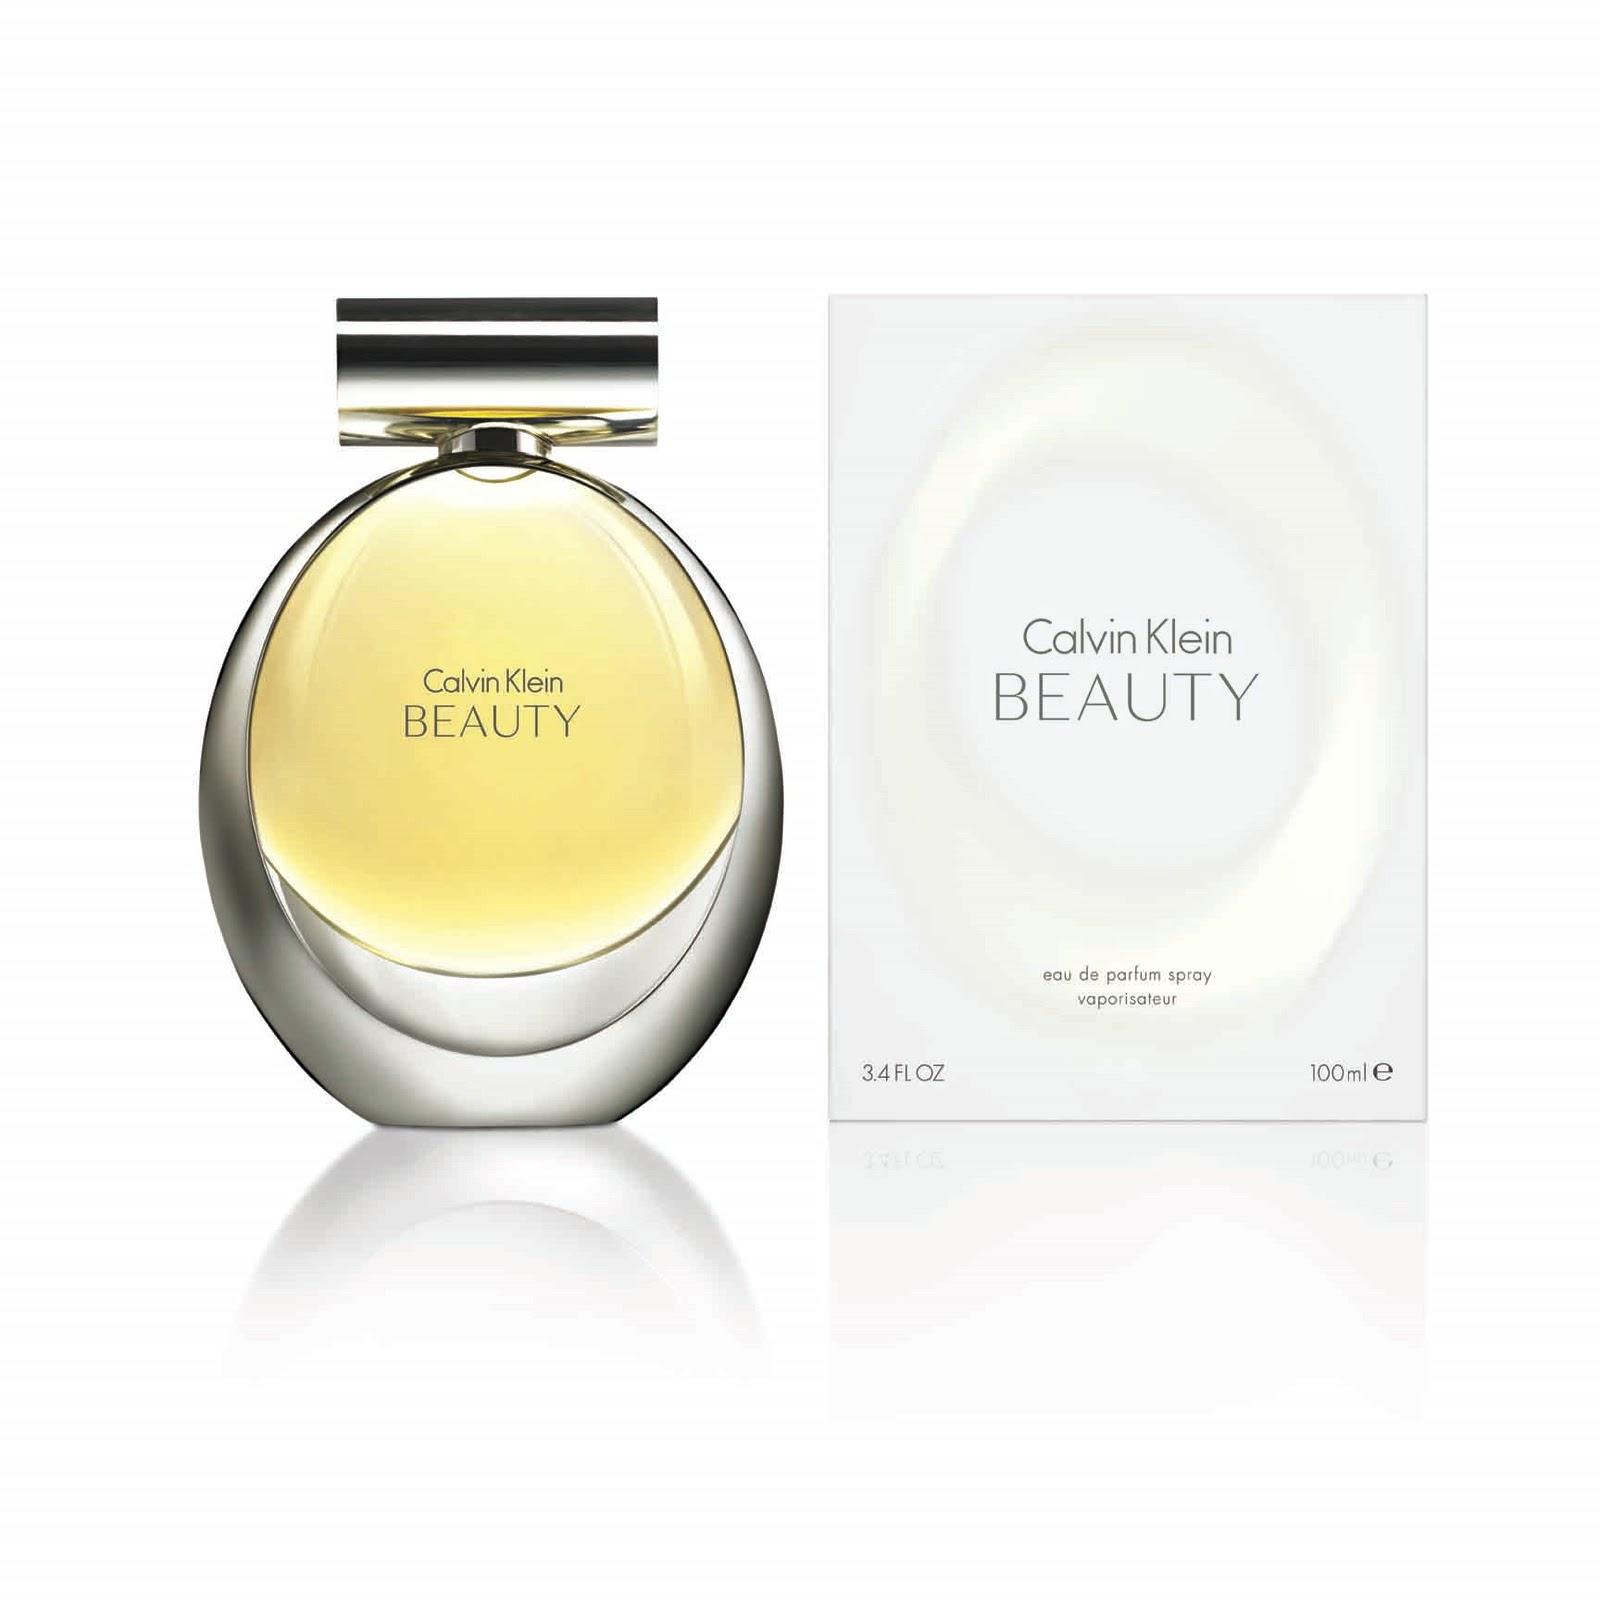 469d7cf25 Calvin Klein's new fragrance- Beauty